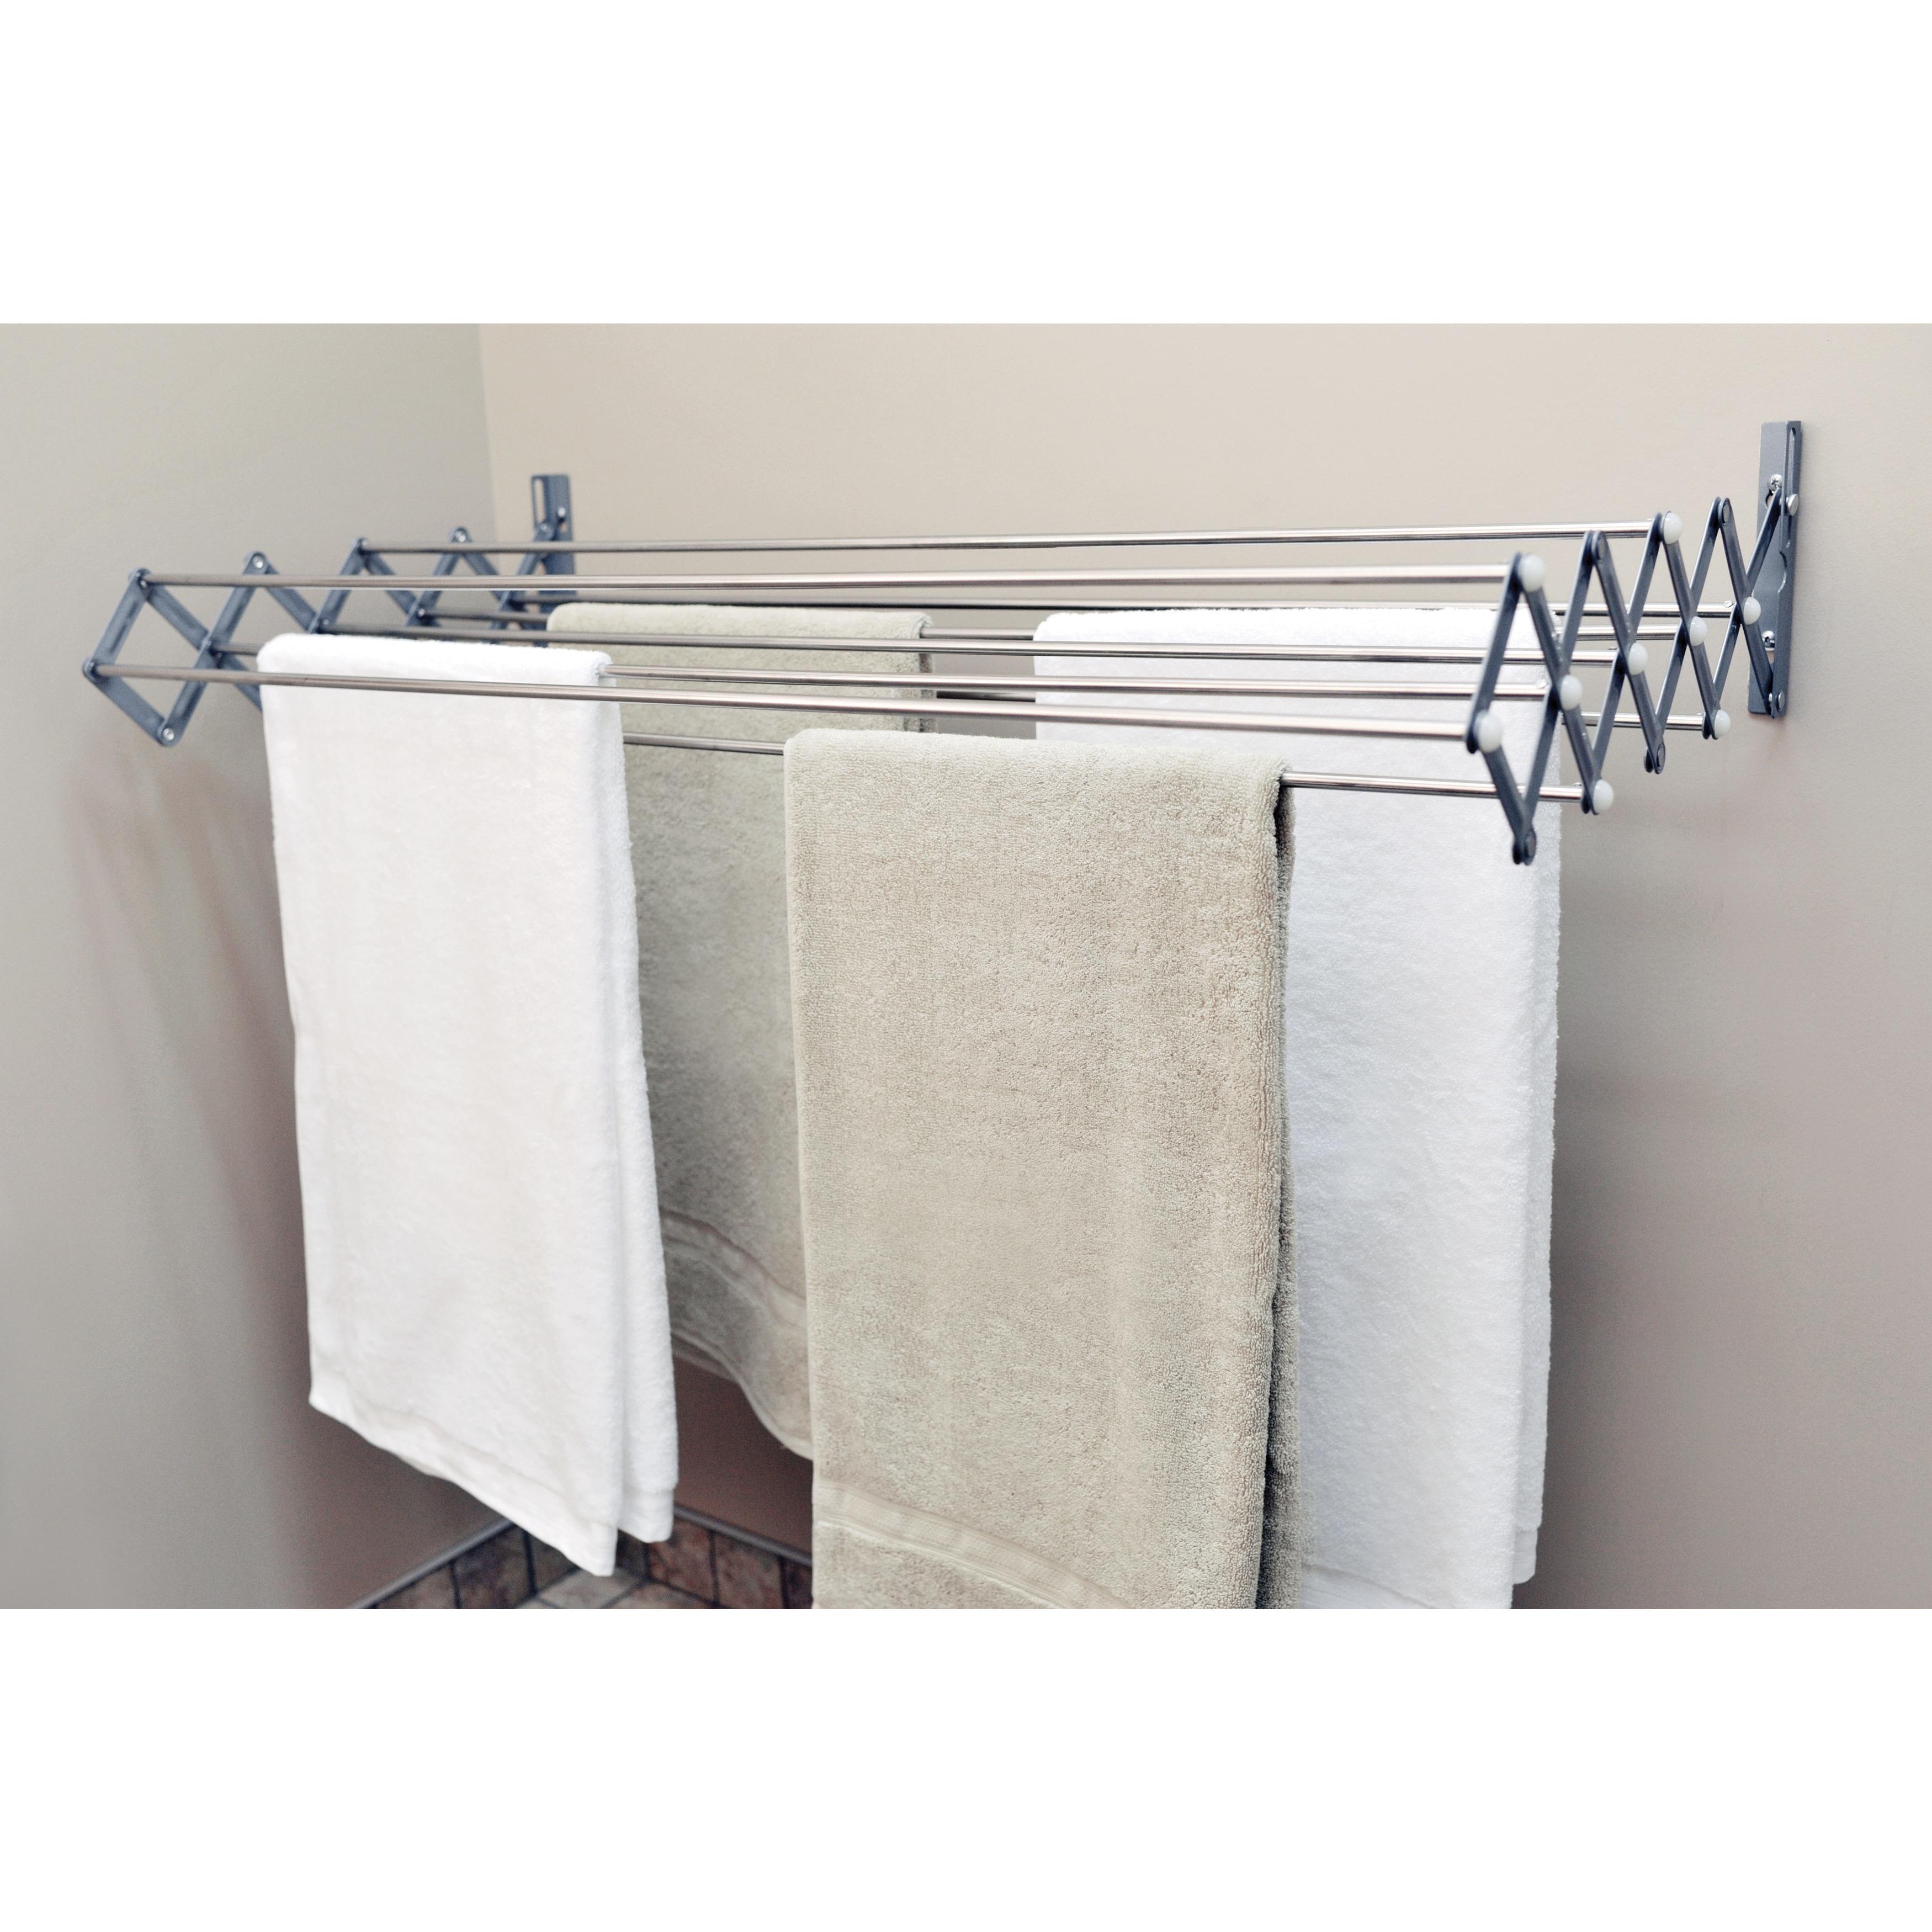 Accordion Drying Rack 16325577 Overstock Com Shopping